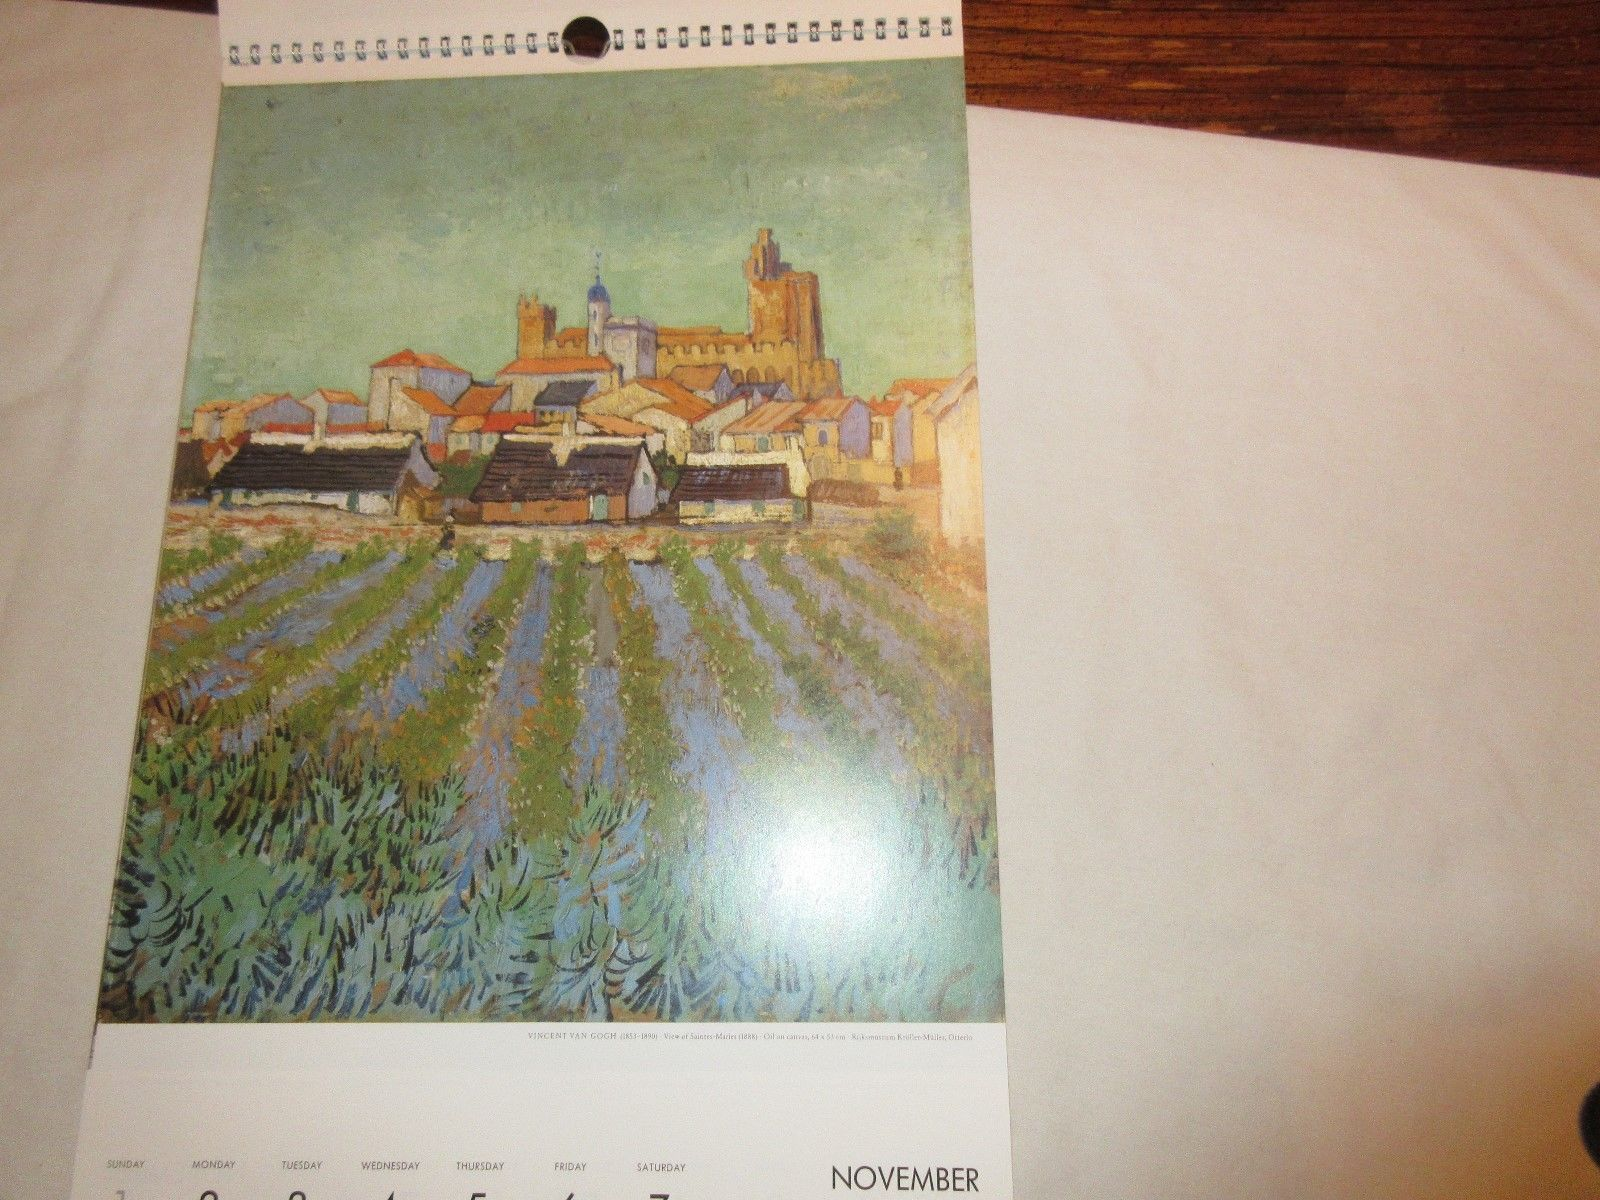 Rx , Pharmacy , Calendar , Hoechst-Roussel Pharmaceuticals Inc.,1987 , Vintage image 11